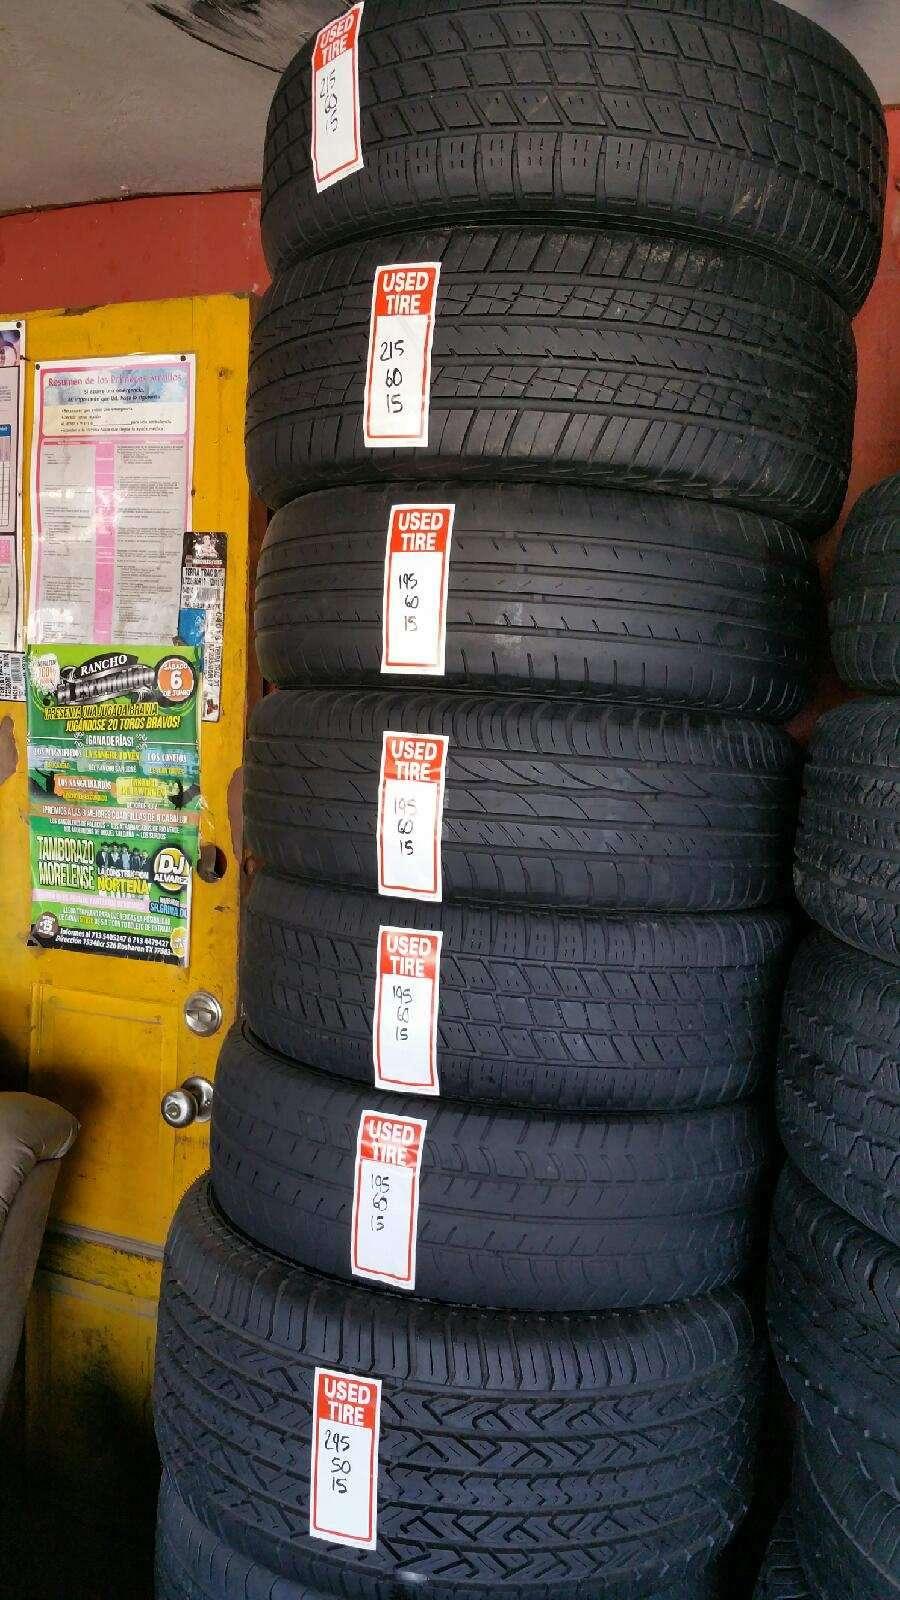 Rodriguez Tire shop - car repair  | Photo 4 of 8 | Address: 16431 FM 521 Rd, Rosharon, TX 77583, USA | Phone: (832) 894-2732